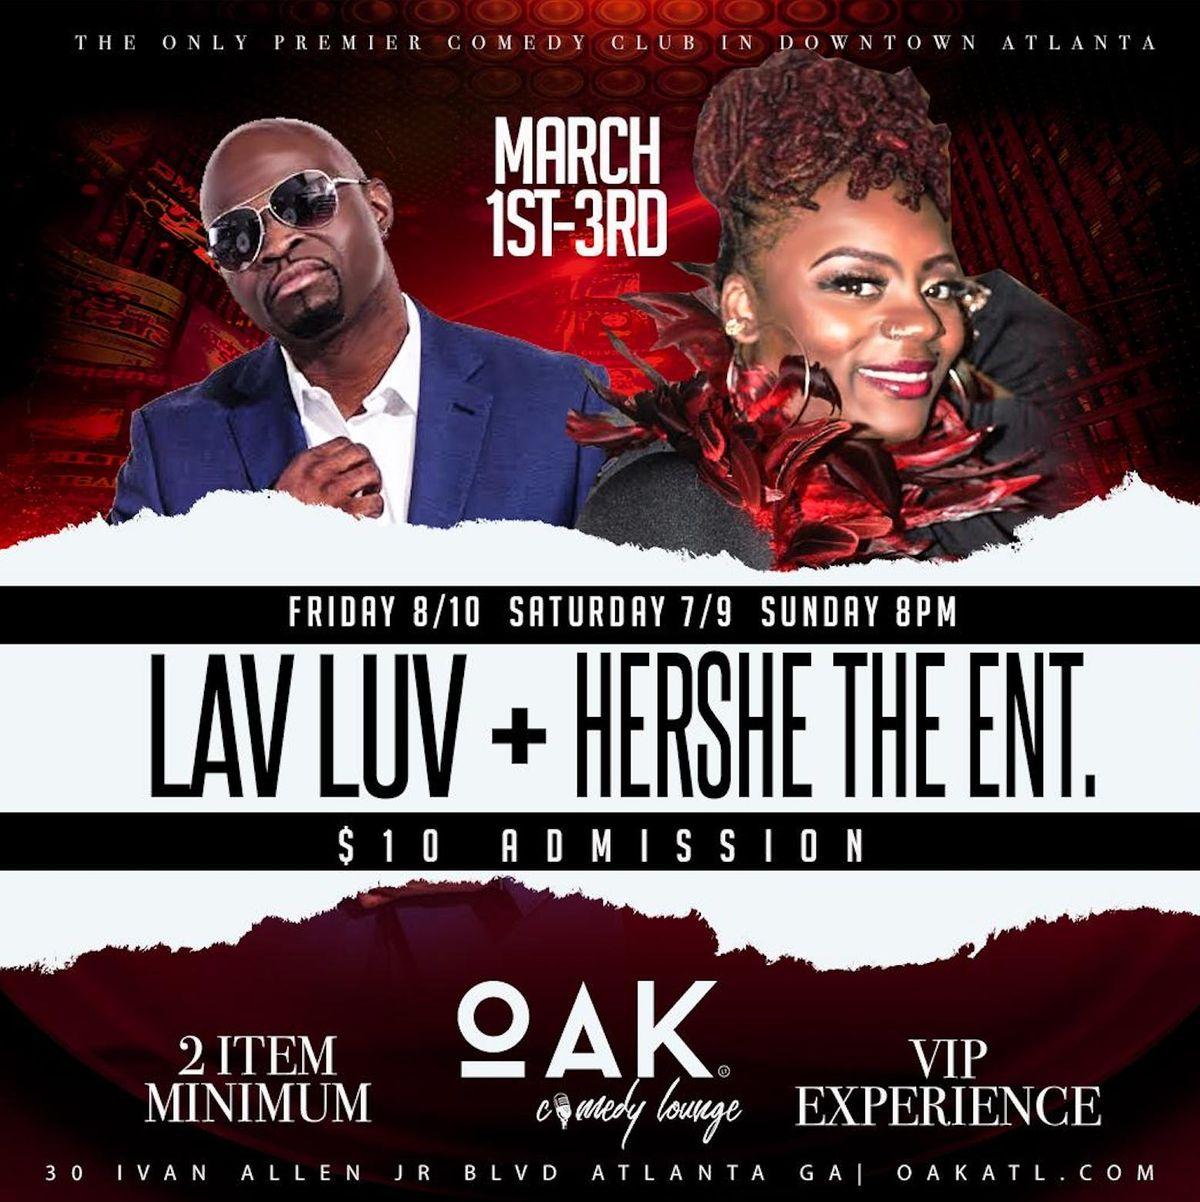 Lav Luv  Hershe the Ent at OAK Atlanta Comedy Live